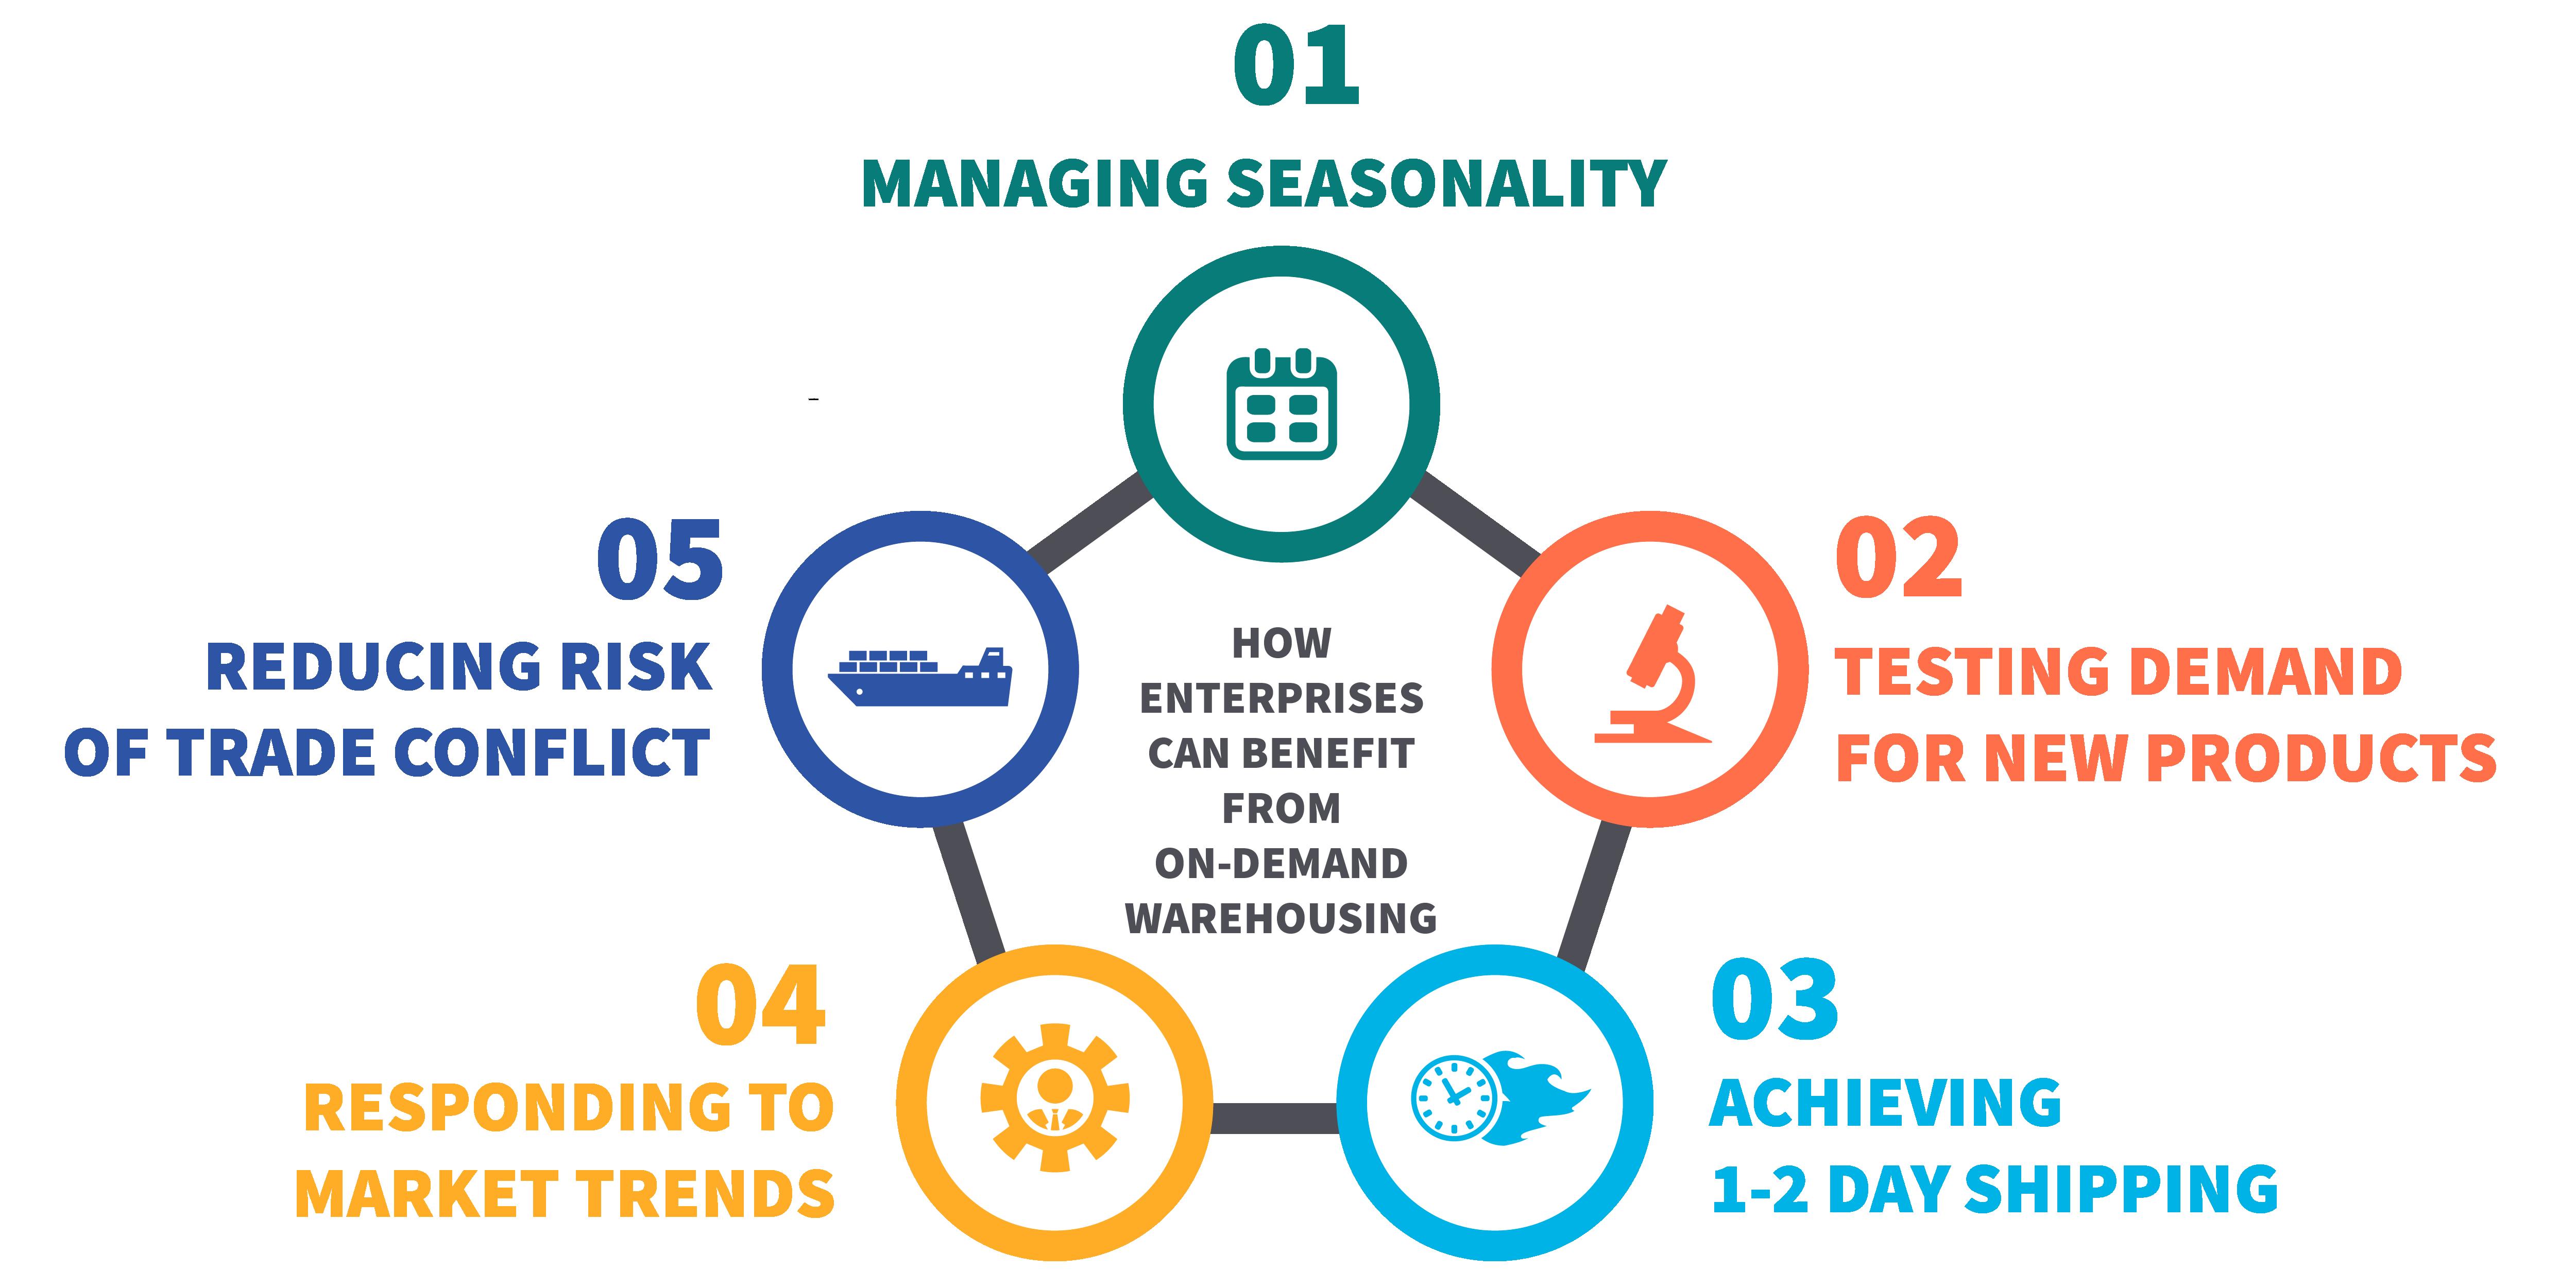 Enterprise use cases for on-demand warehousing